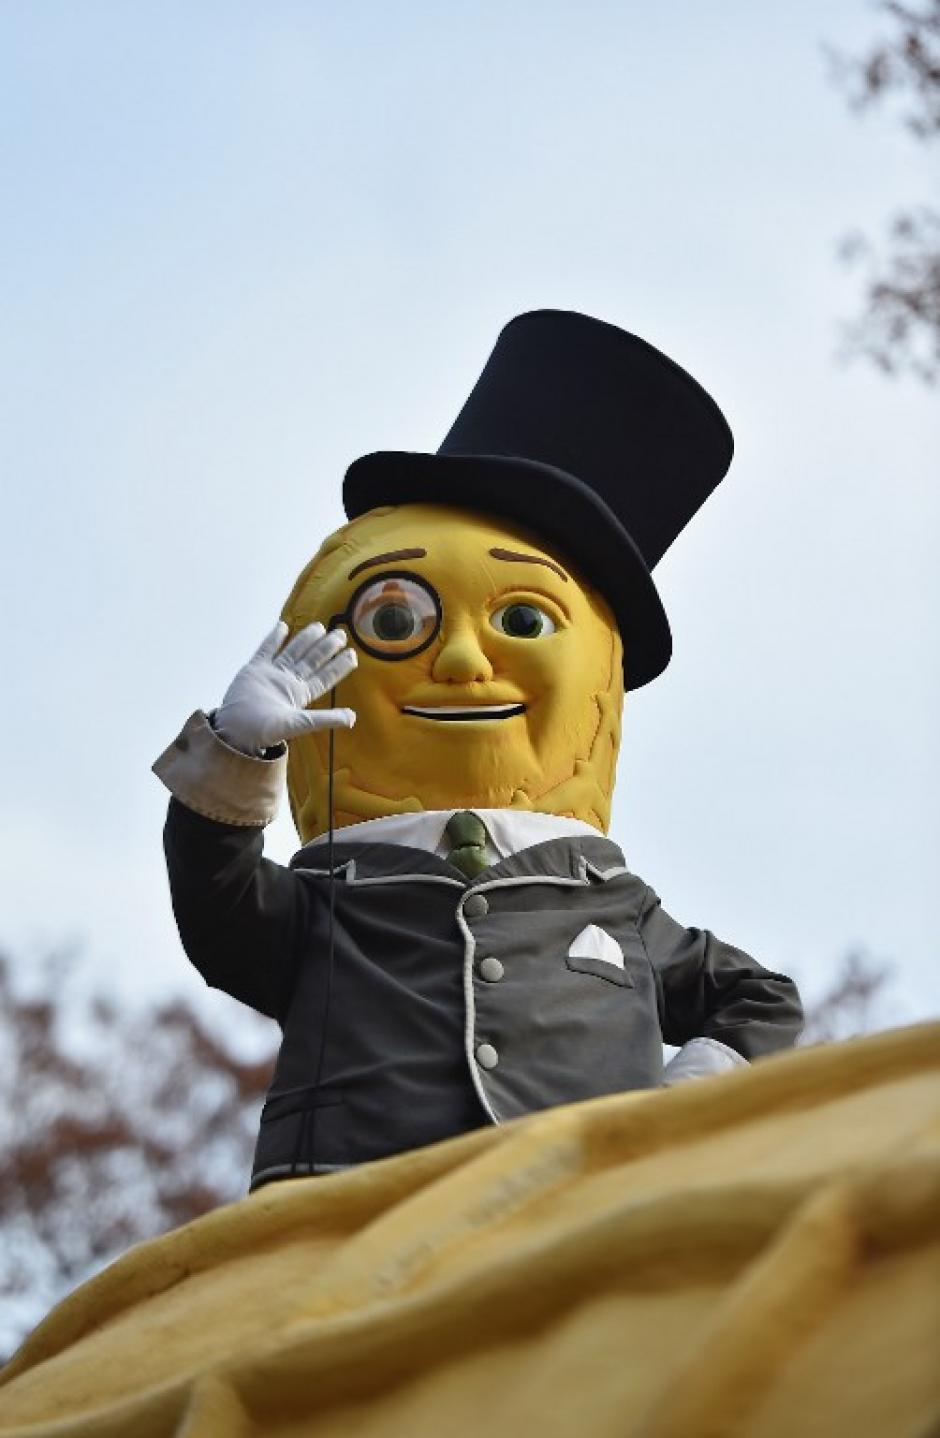 Mister Peanut participó del desfile alegórico. (Foto: AFP)